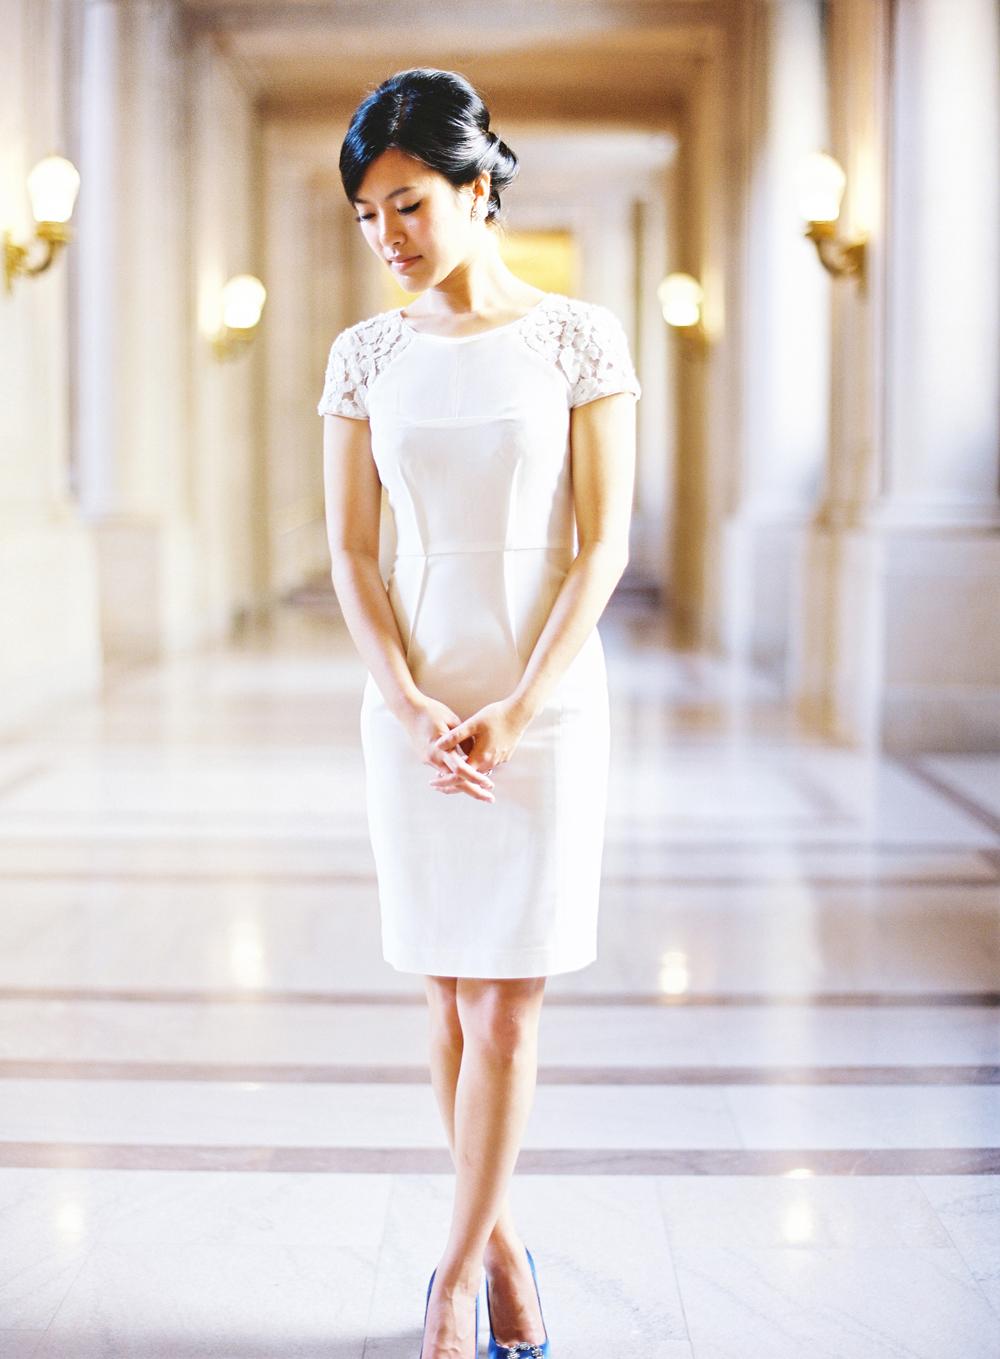 Short Casual Bridal Dress Elizabeth Anne Designs The